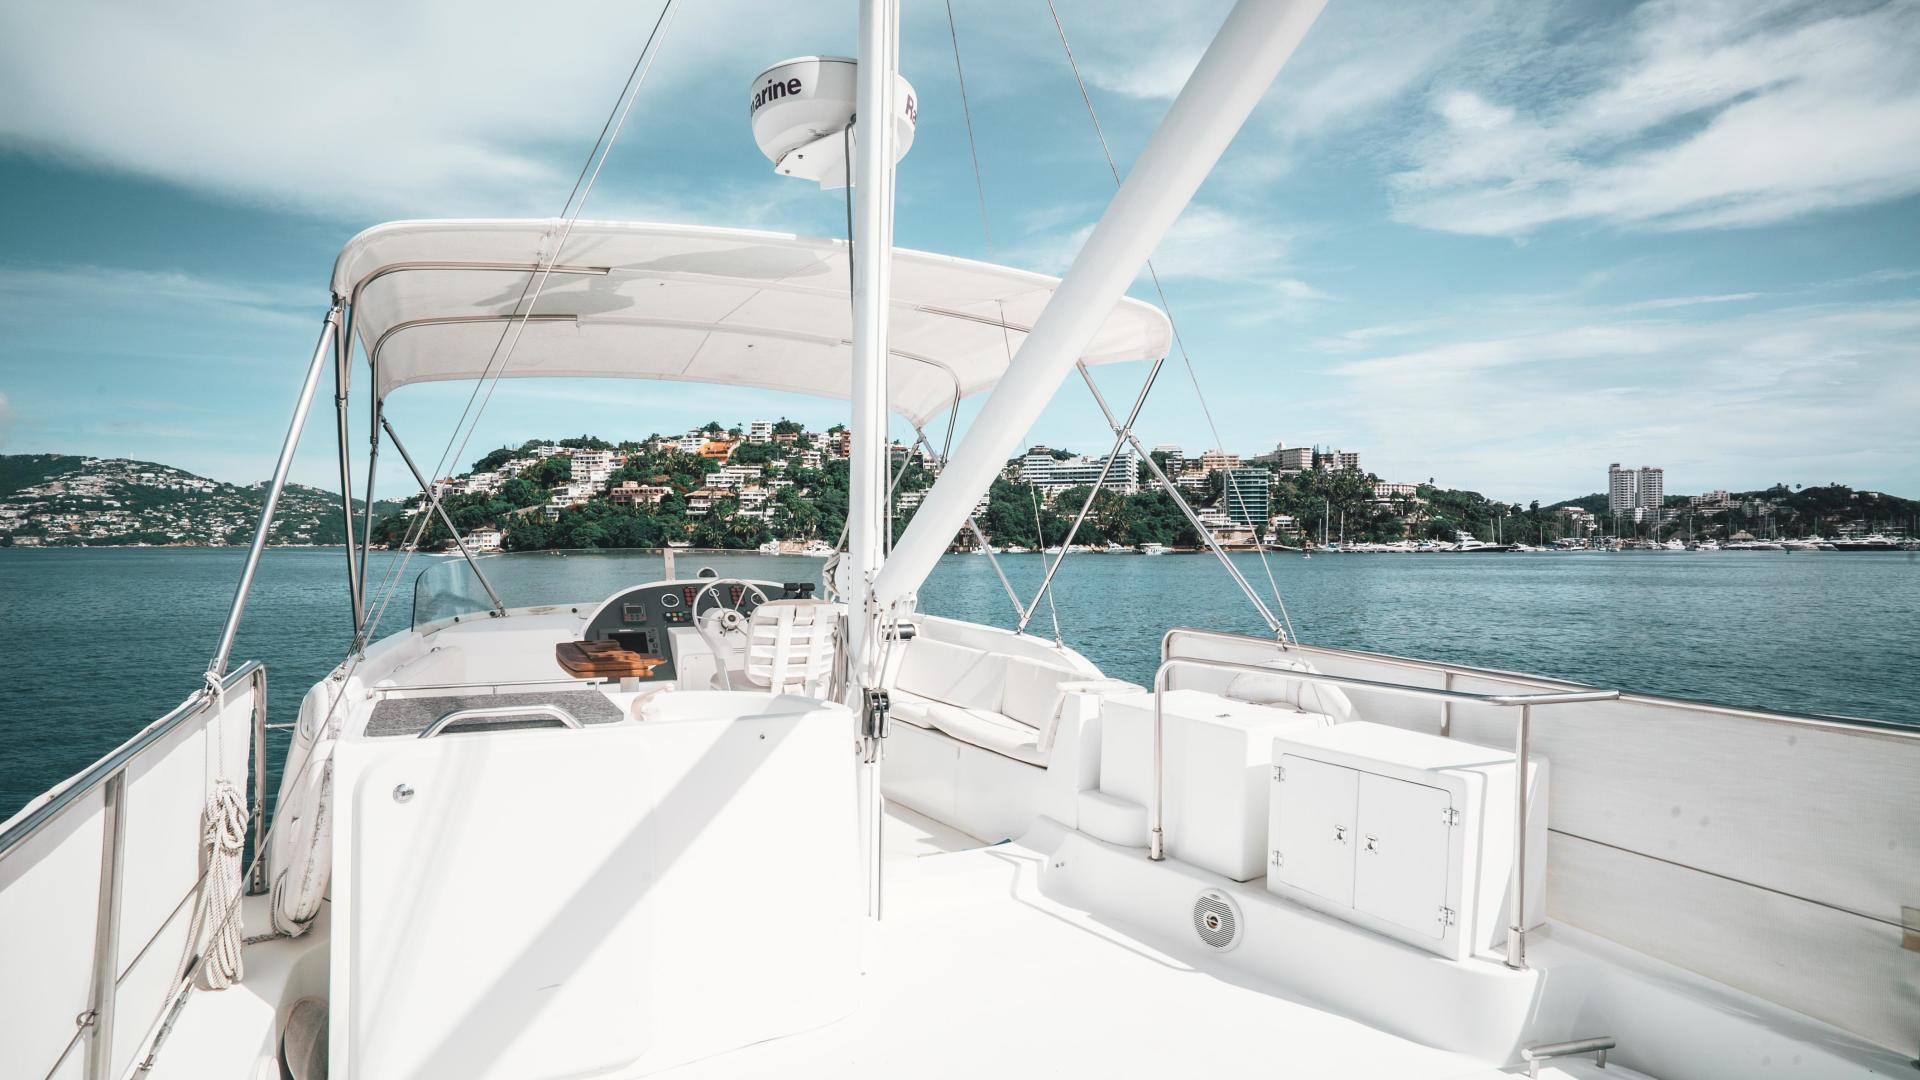 Beneteau-Swift Trawler 2008-Amadeus Acapulco-Mexico-1487036 | Thumbnail